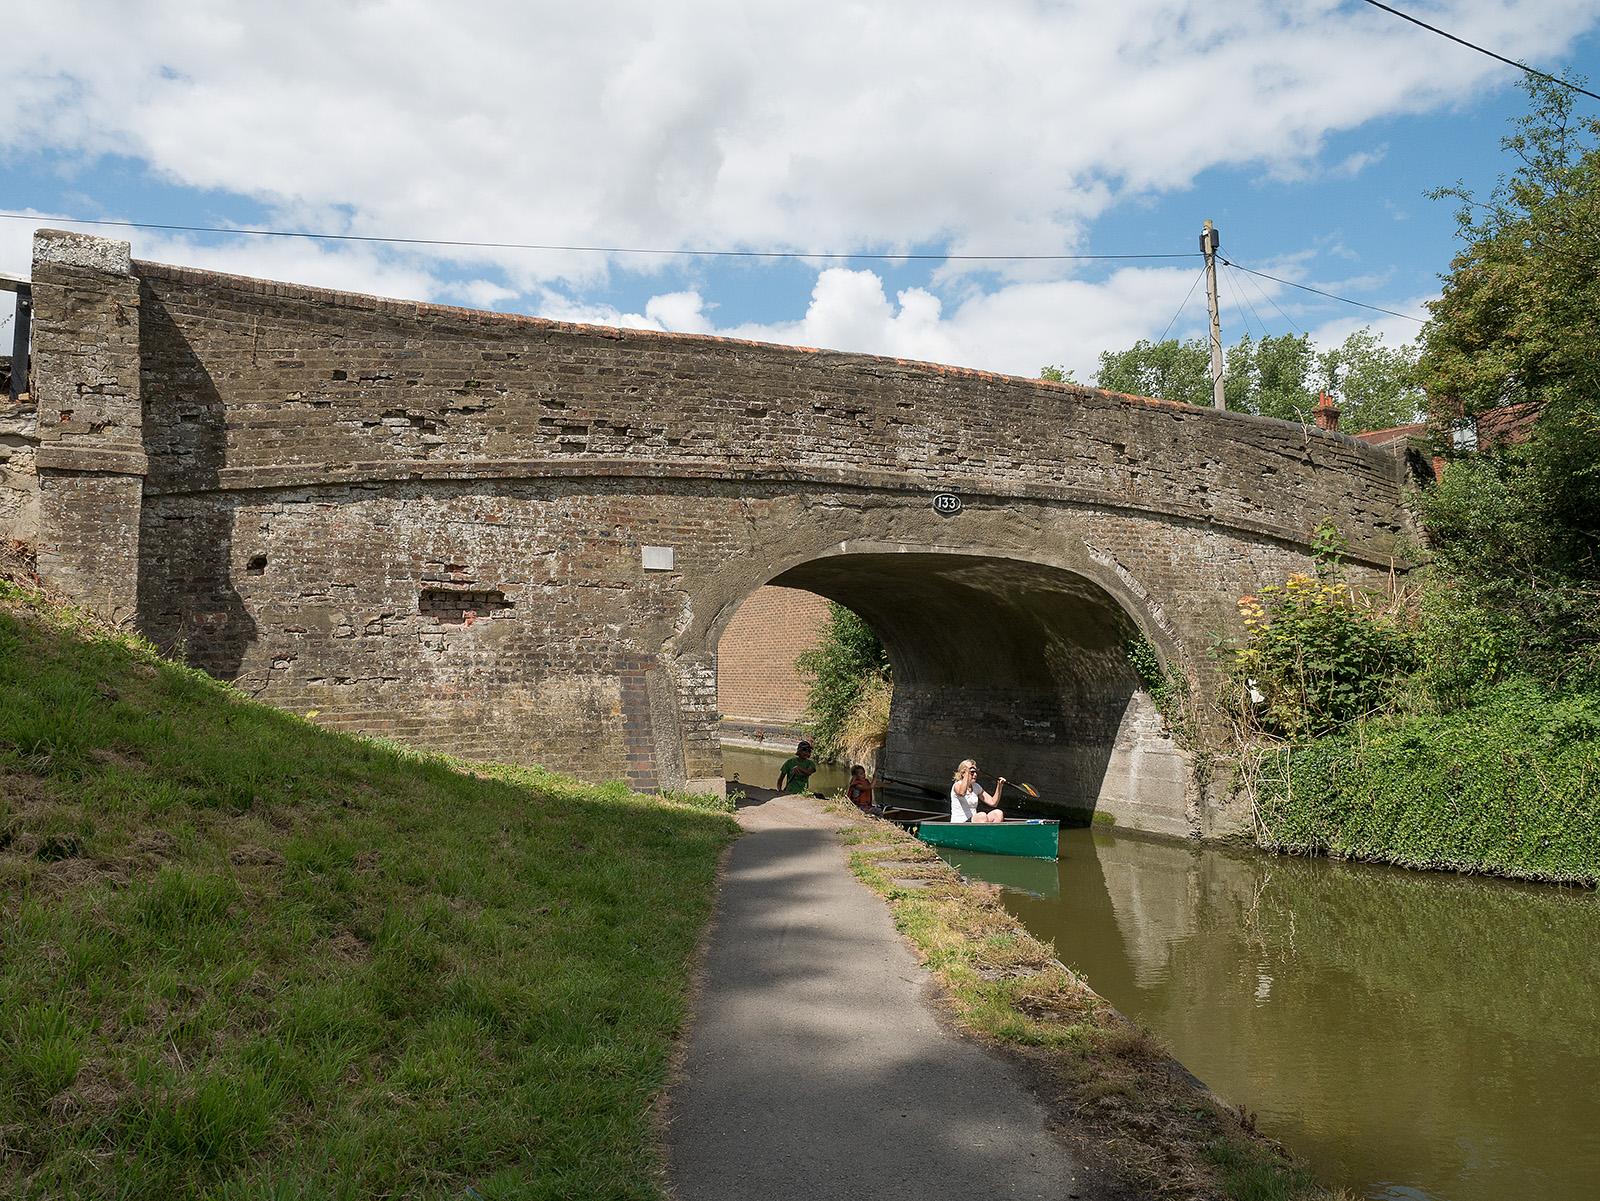 Upper Icknield Way bridge